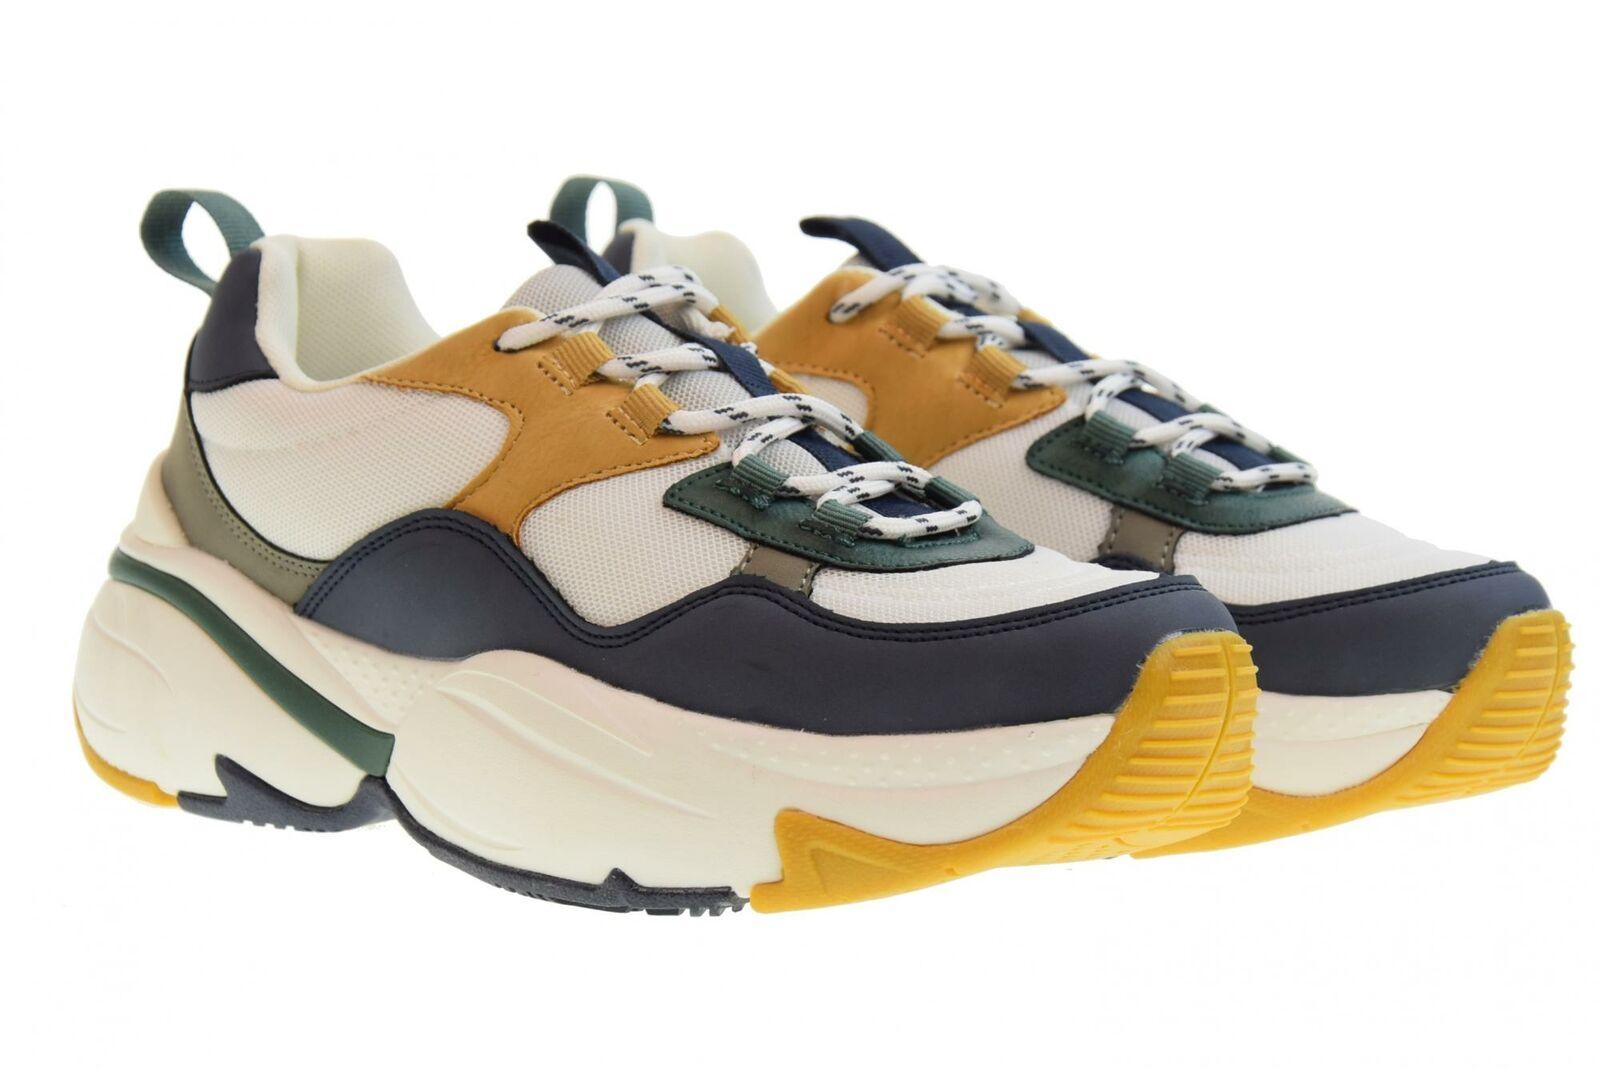 Victoria P19u shoes woman low sneakers 147102 blue